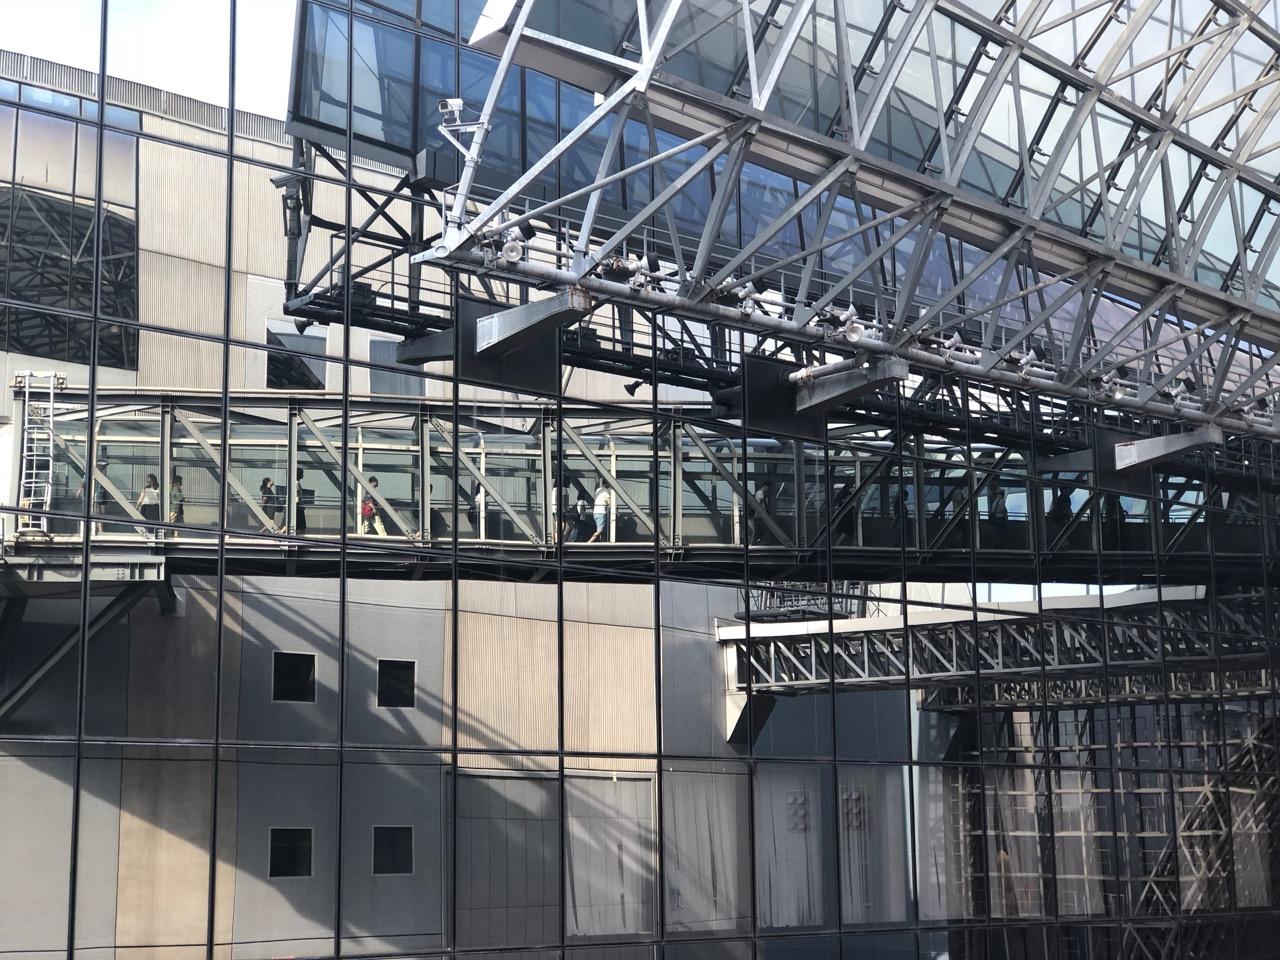 Kyoto Station Architecture